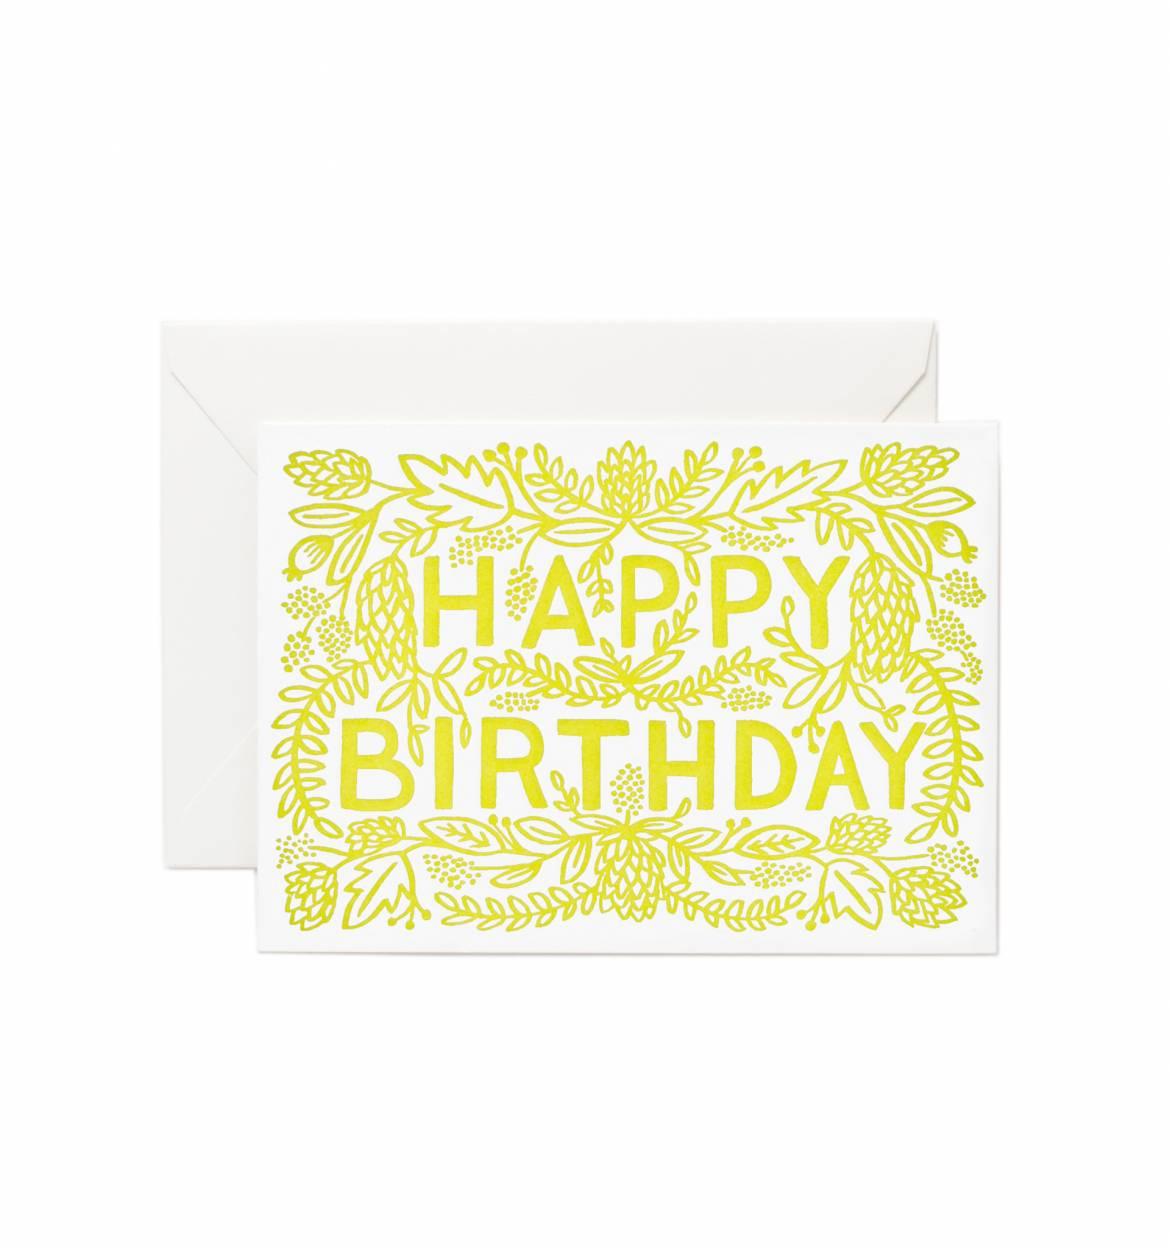 letterpress-happy-birthday-greeting-card-01_4.jpg